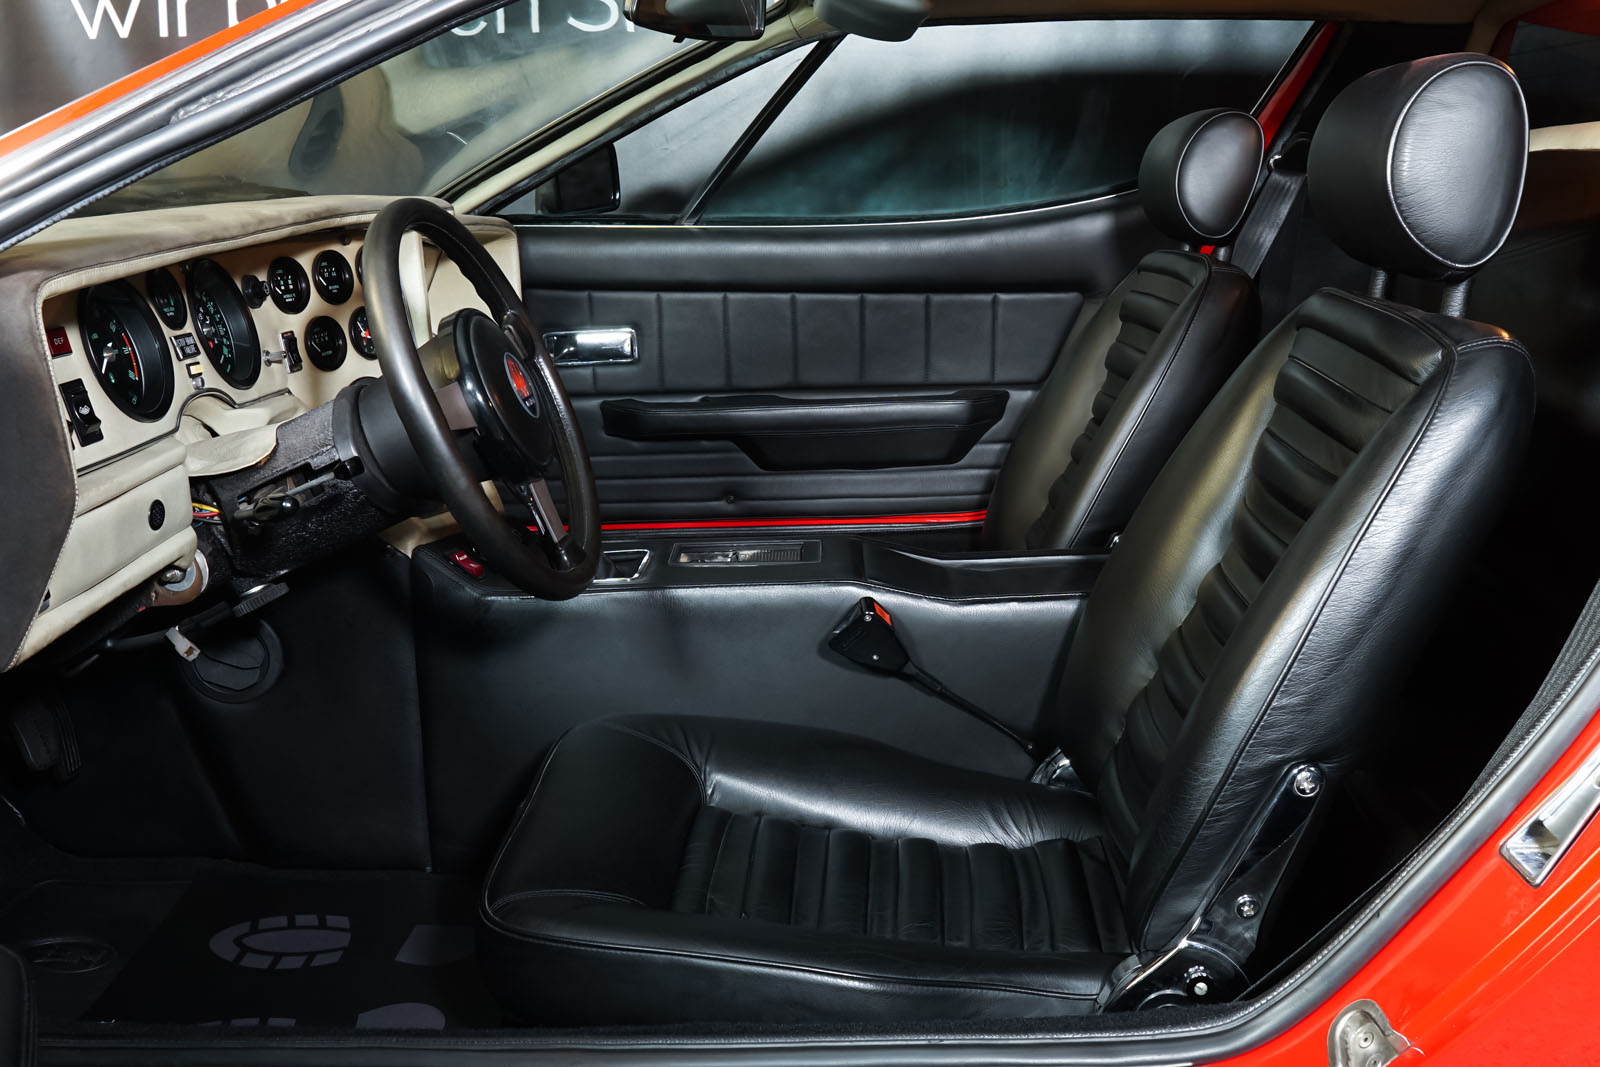 Maserati_Merak_Rot_Schwarz_MAS-4094_7_w